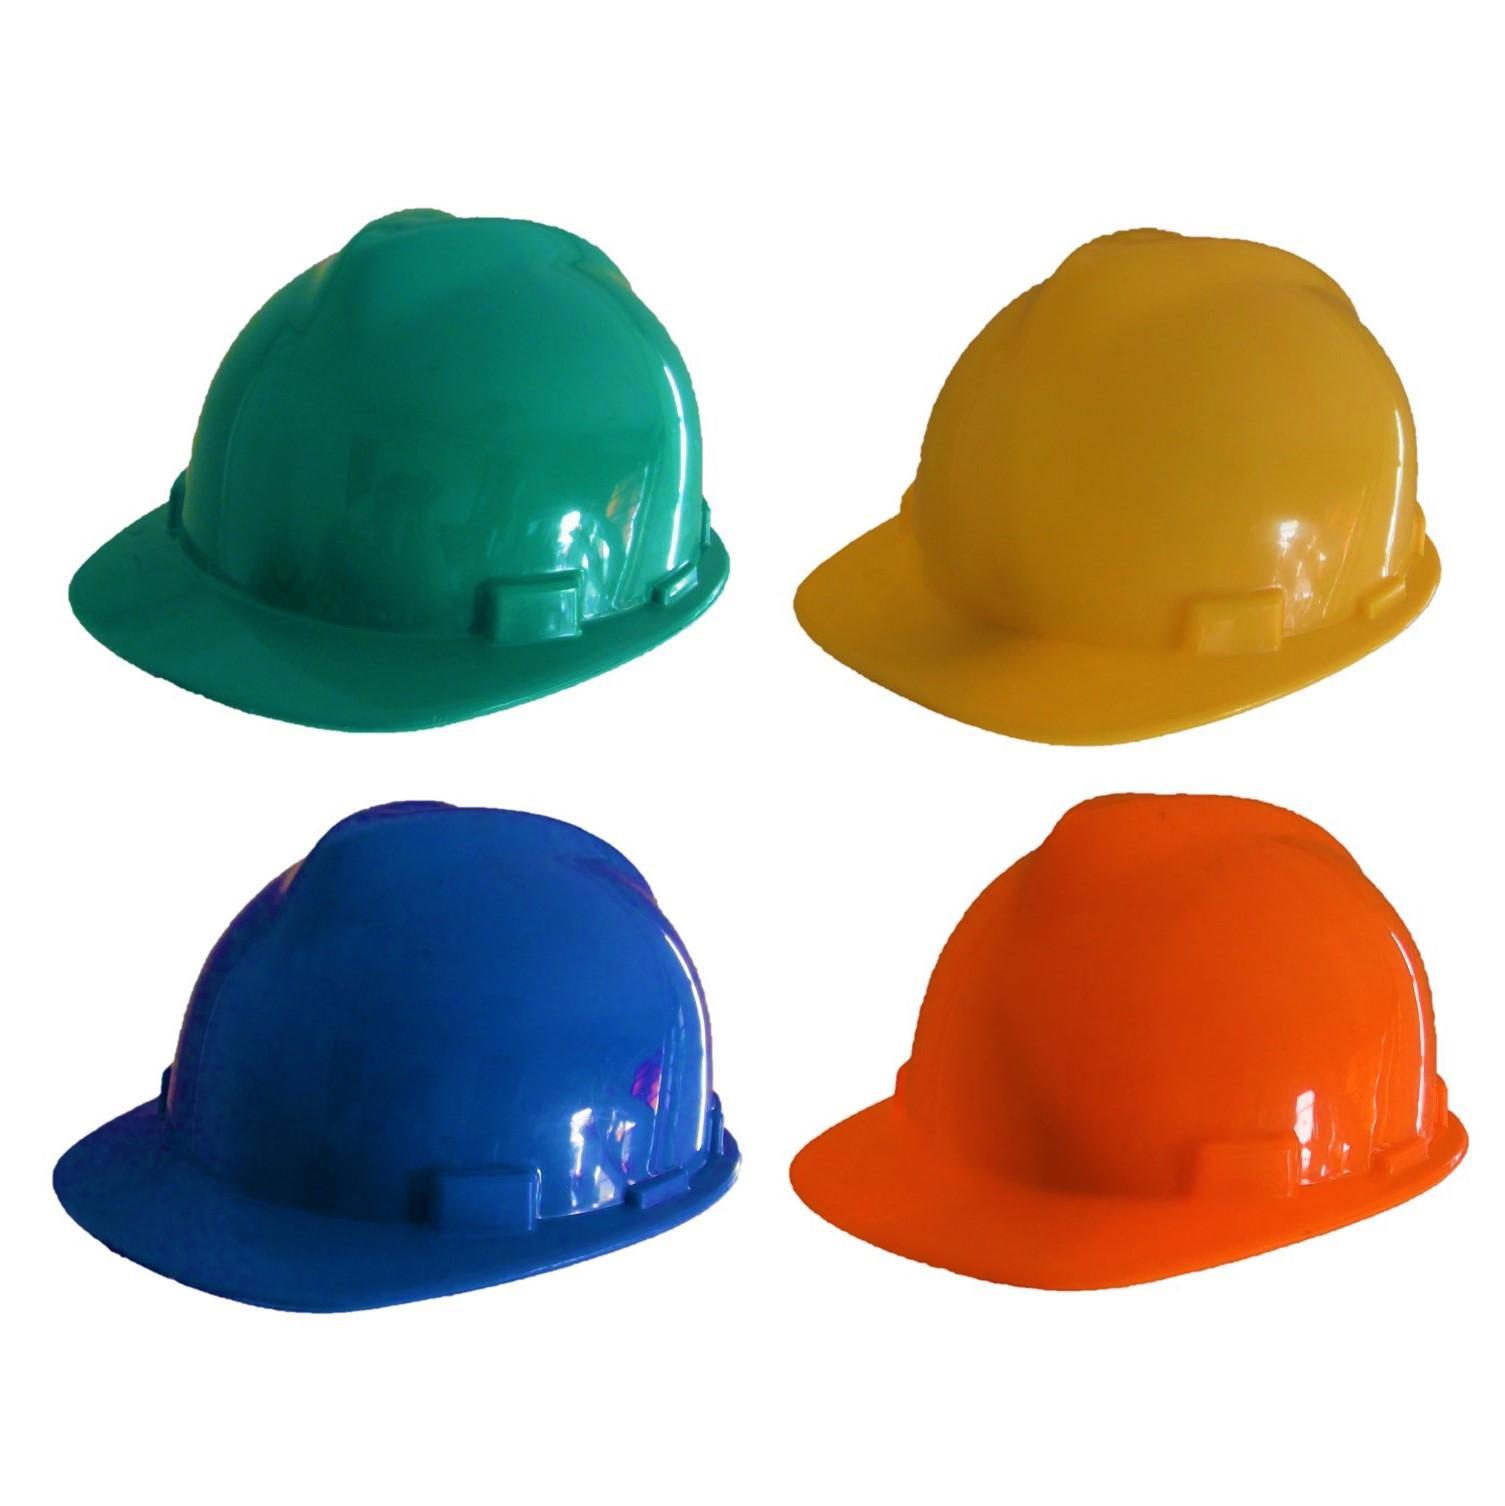 260b823d999 Plastic Construction Hard Hat Safety Helmet - Blue